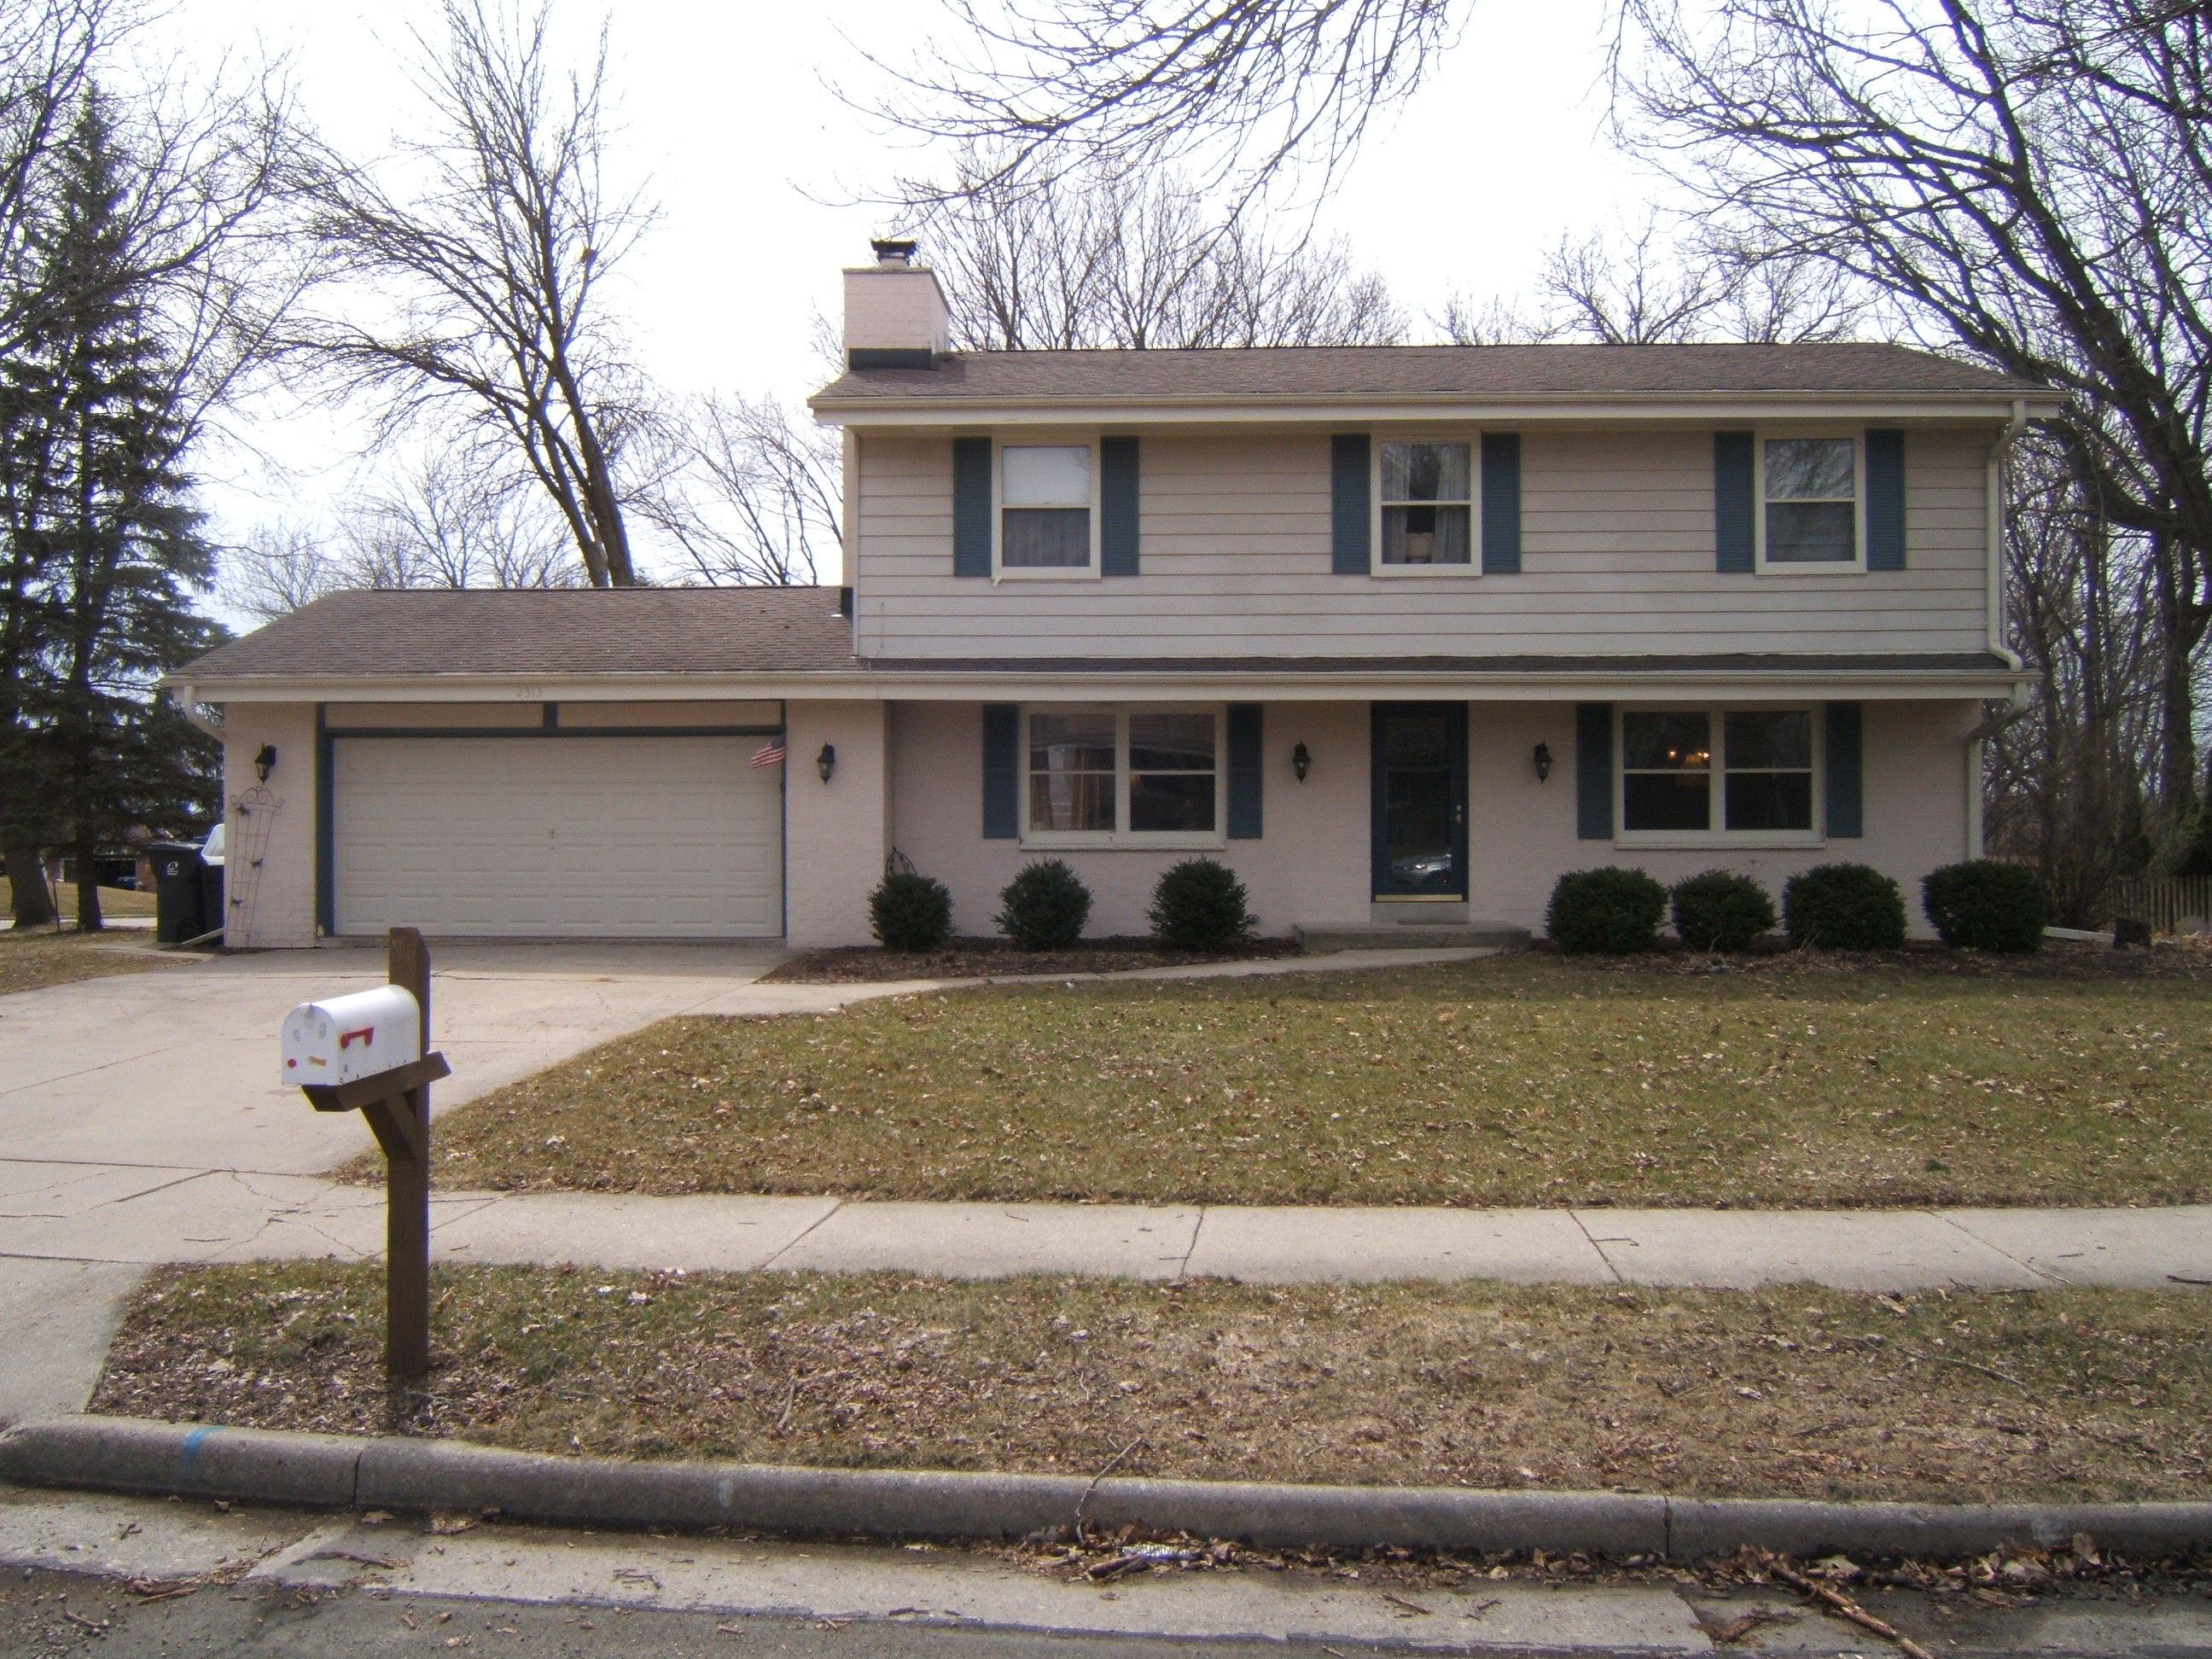 2313 Pendleton Pl, Waukesha, Wisconsin 53188, 4 Bedrooms Bedrooms, 9 Rooms Rooms,2 BathroomsBathrooms,Single-Family,For Sale,Pendleton Pl,1629178